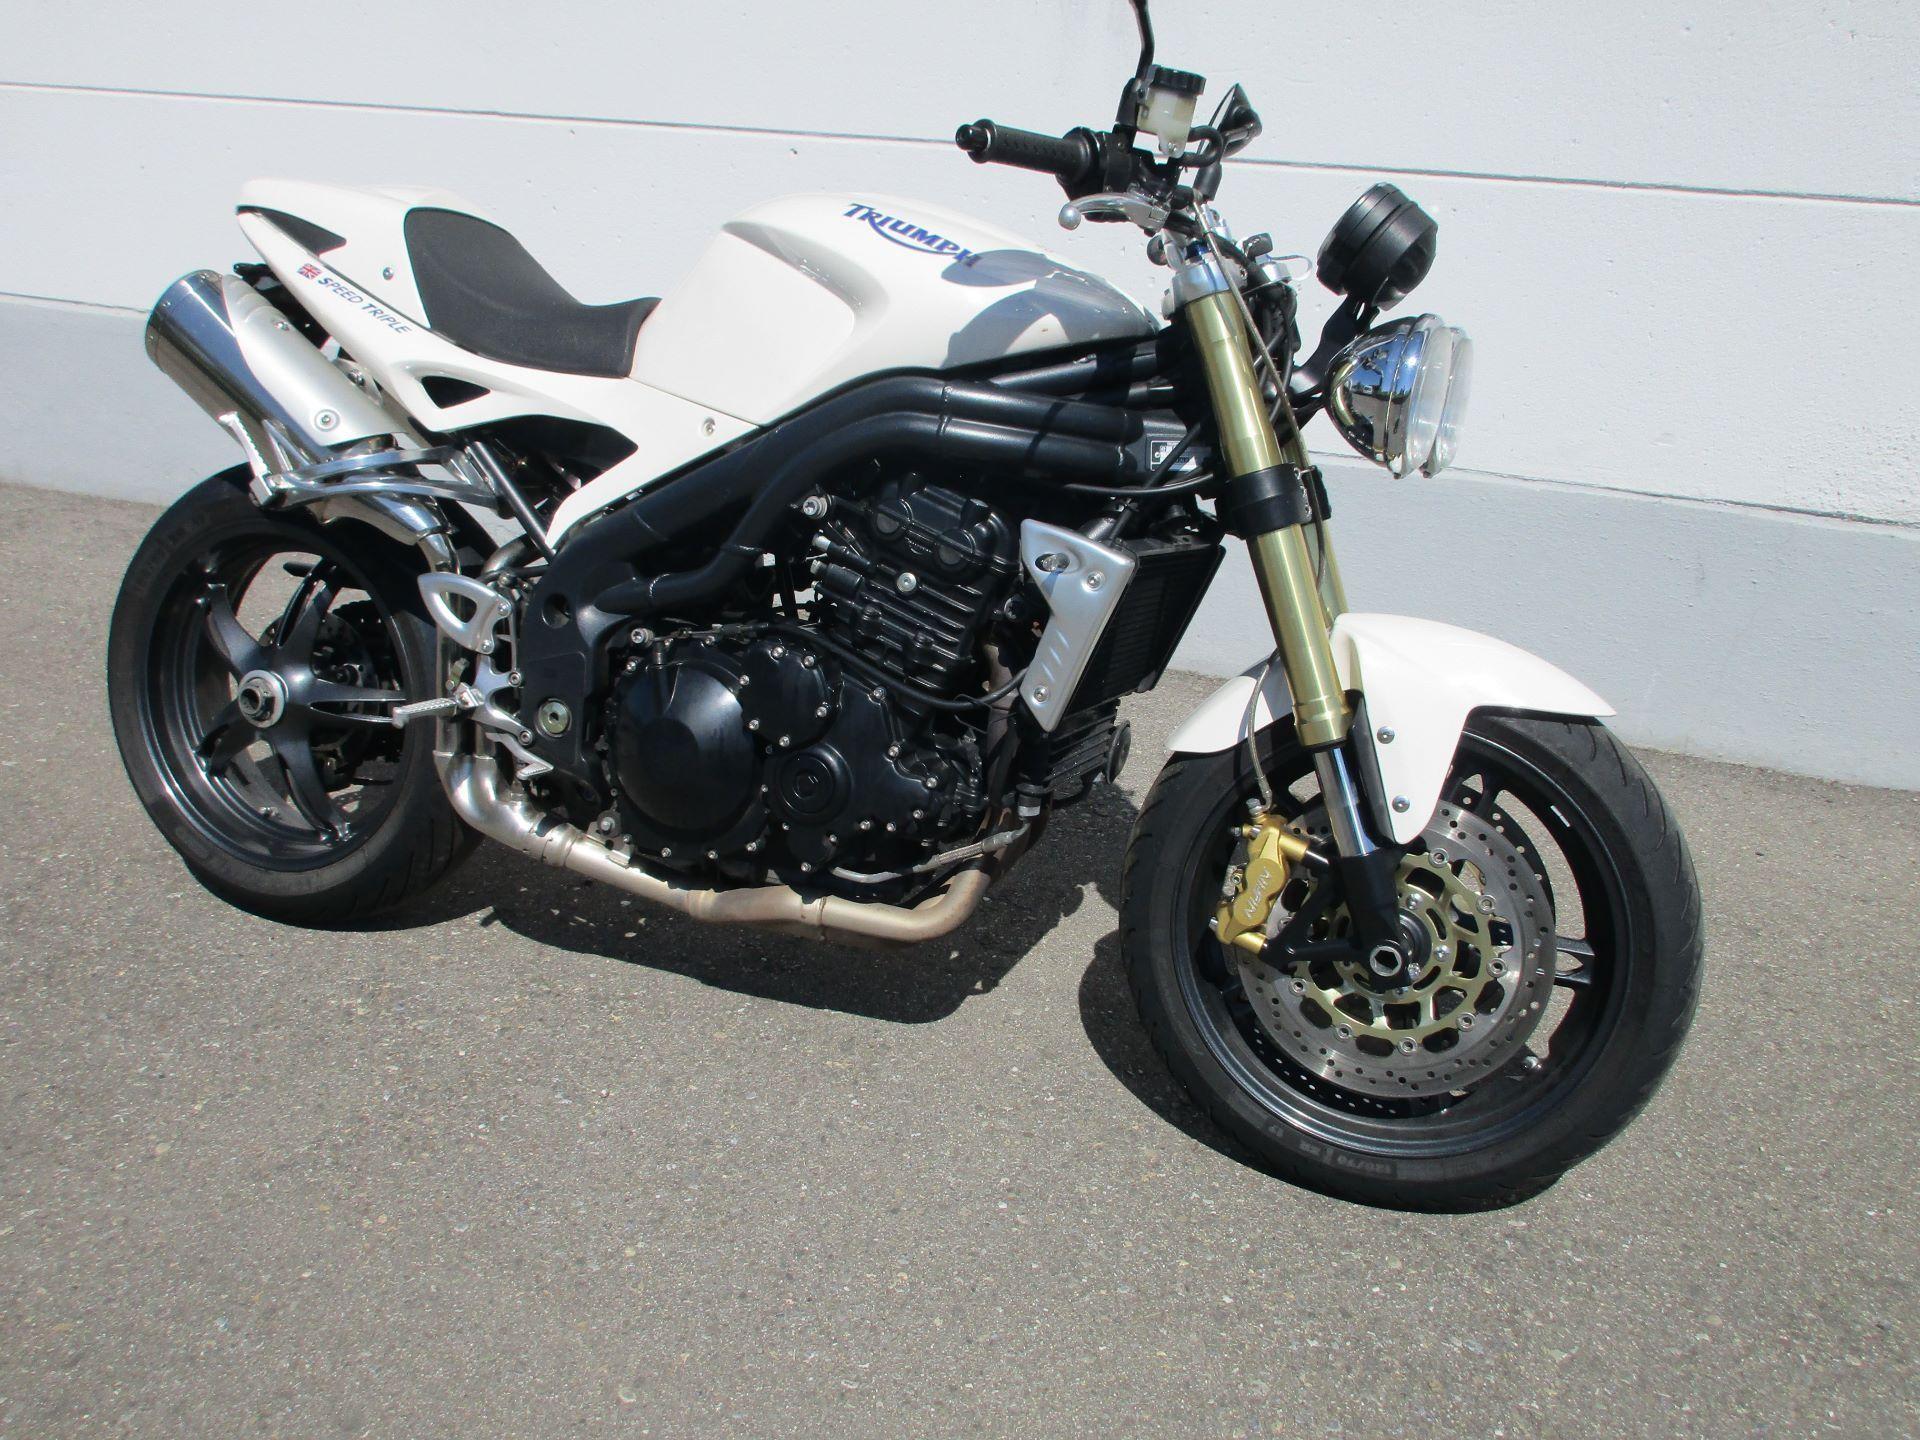 motorrad occasion kaufen triumph speed triple 1050 moto 91 ag h ri. Black Bedroom Furniture Sets. Home Design Ideas